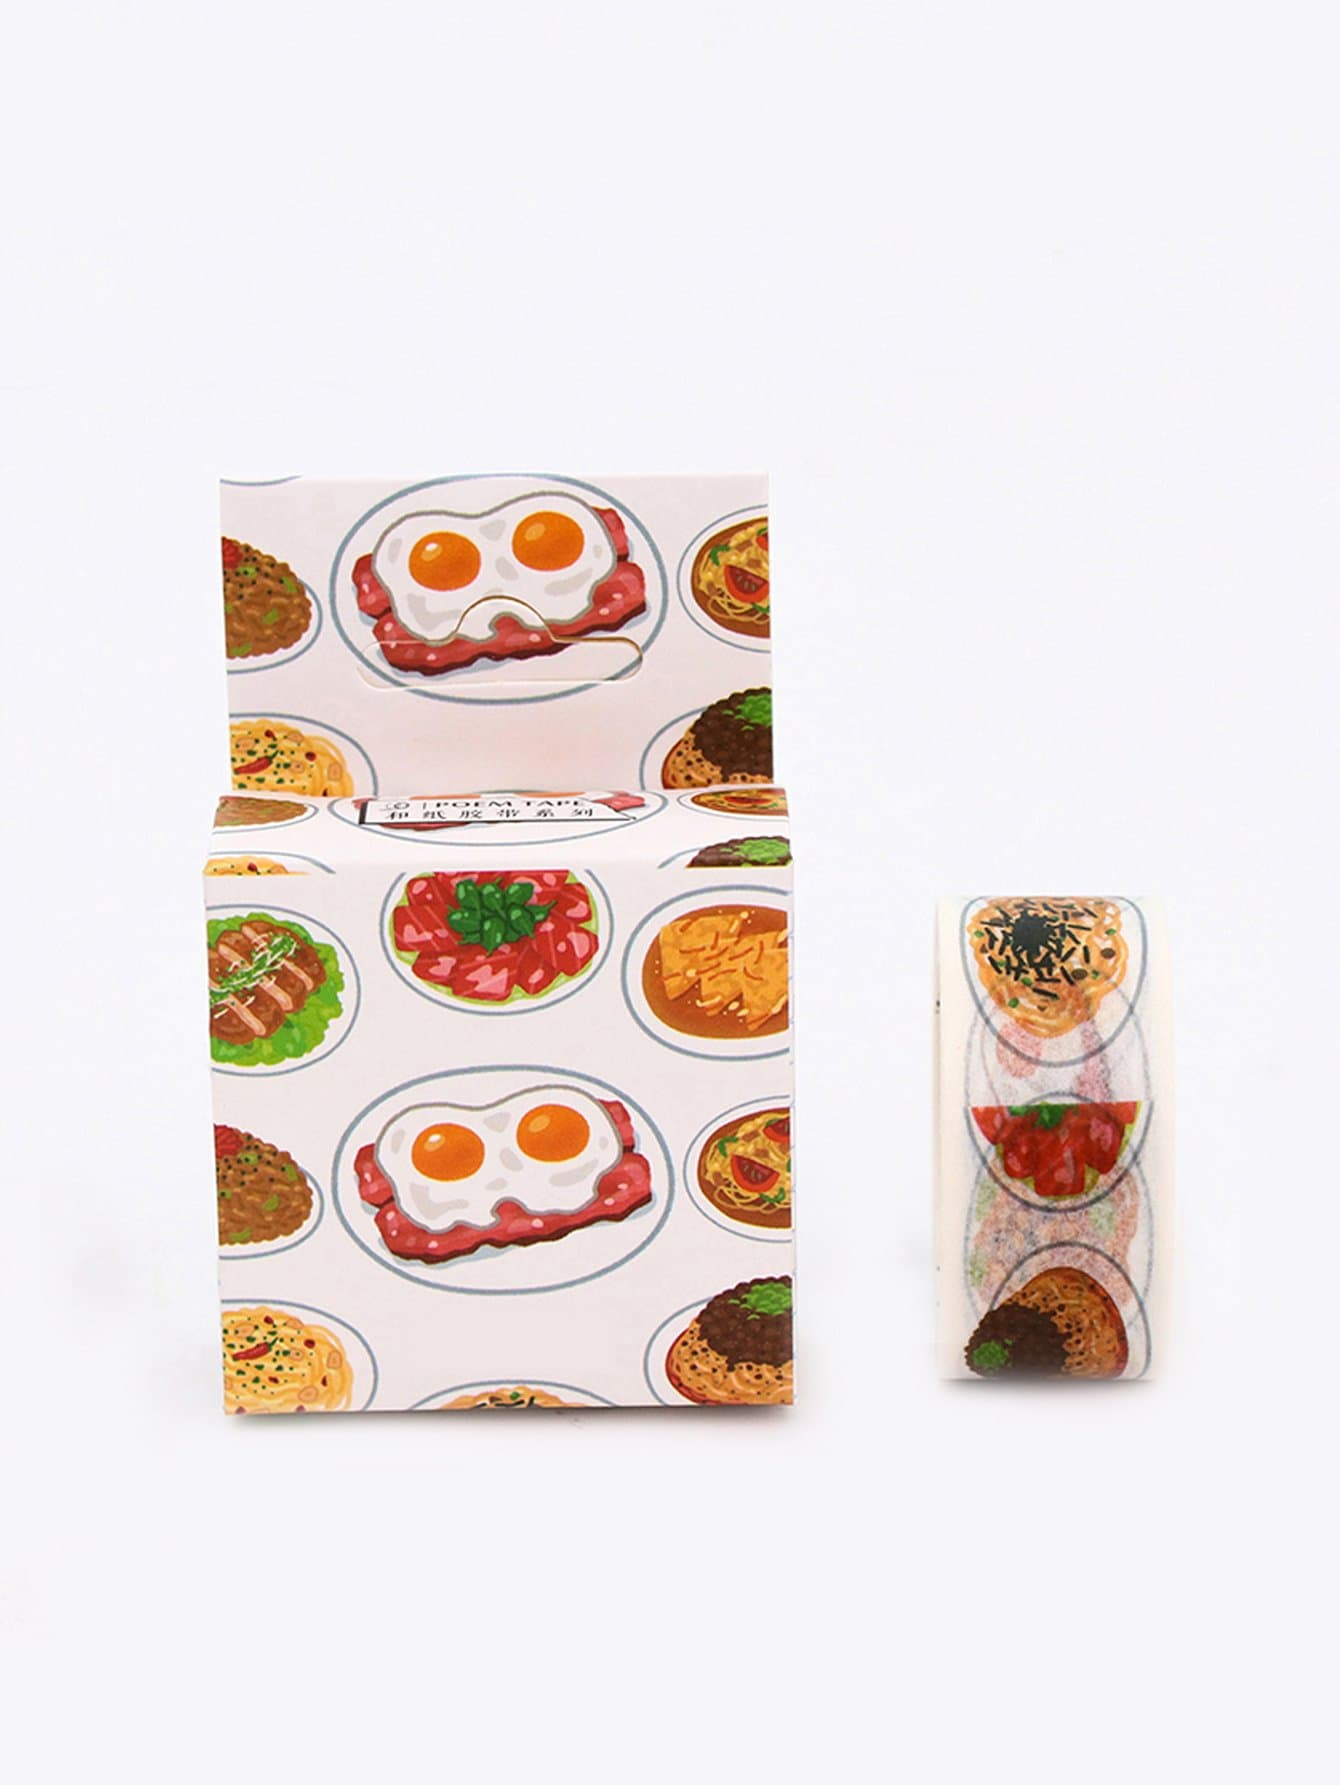 Comic Egg Adhesive Tape sunglasses pattern adhesive tape